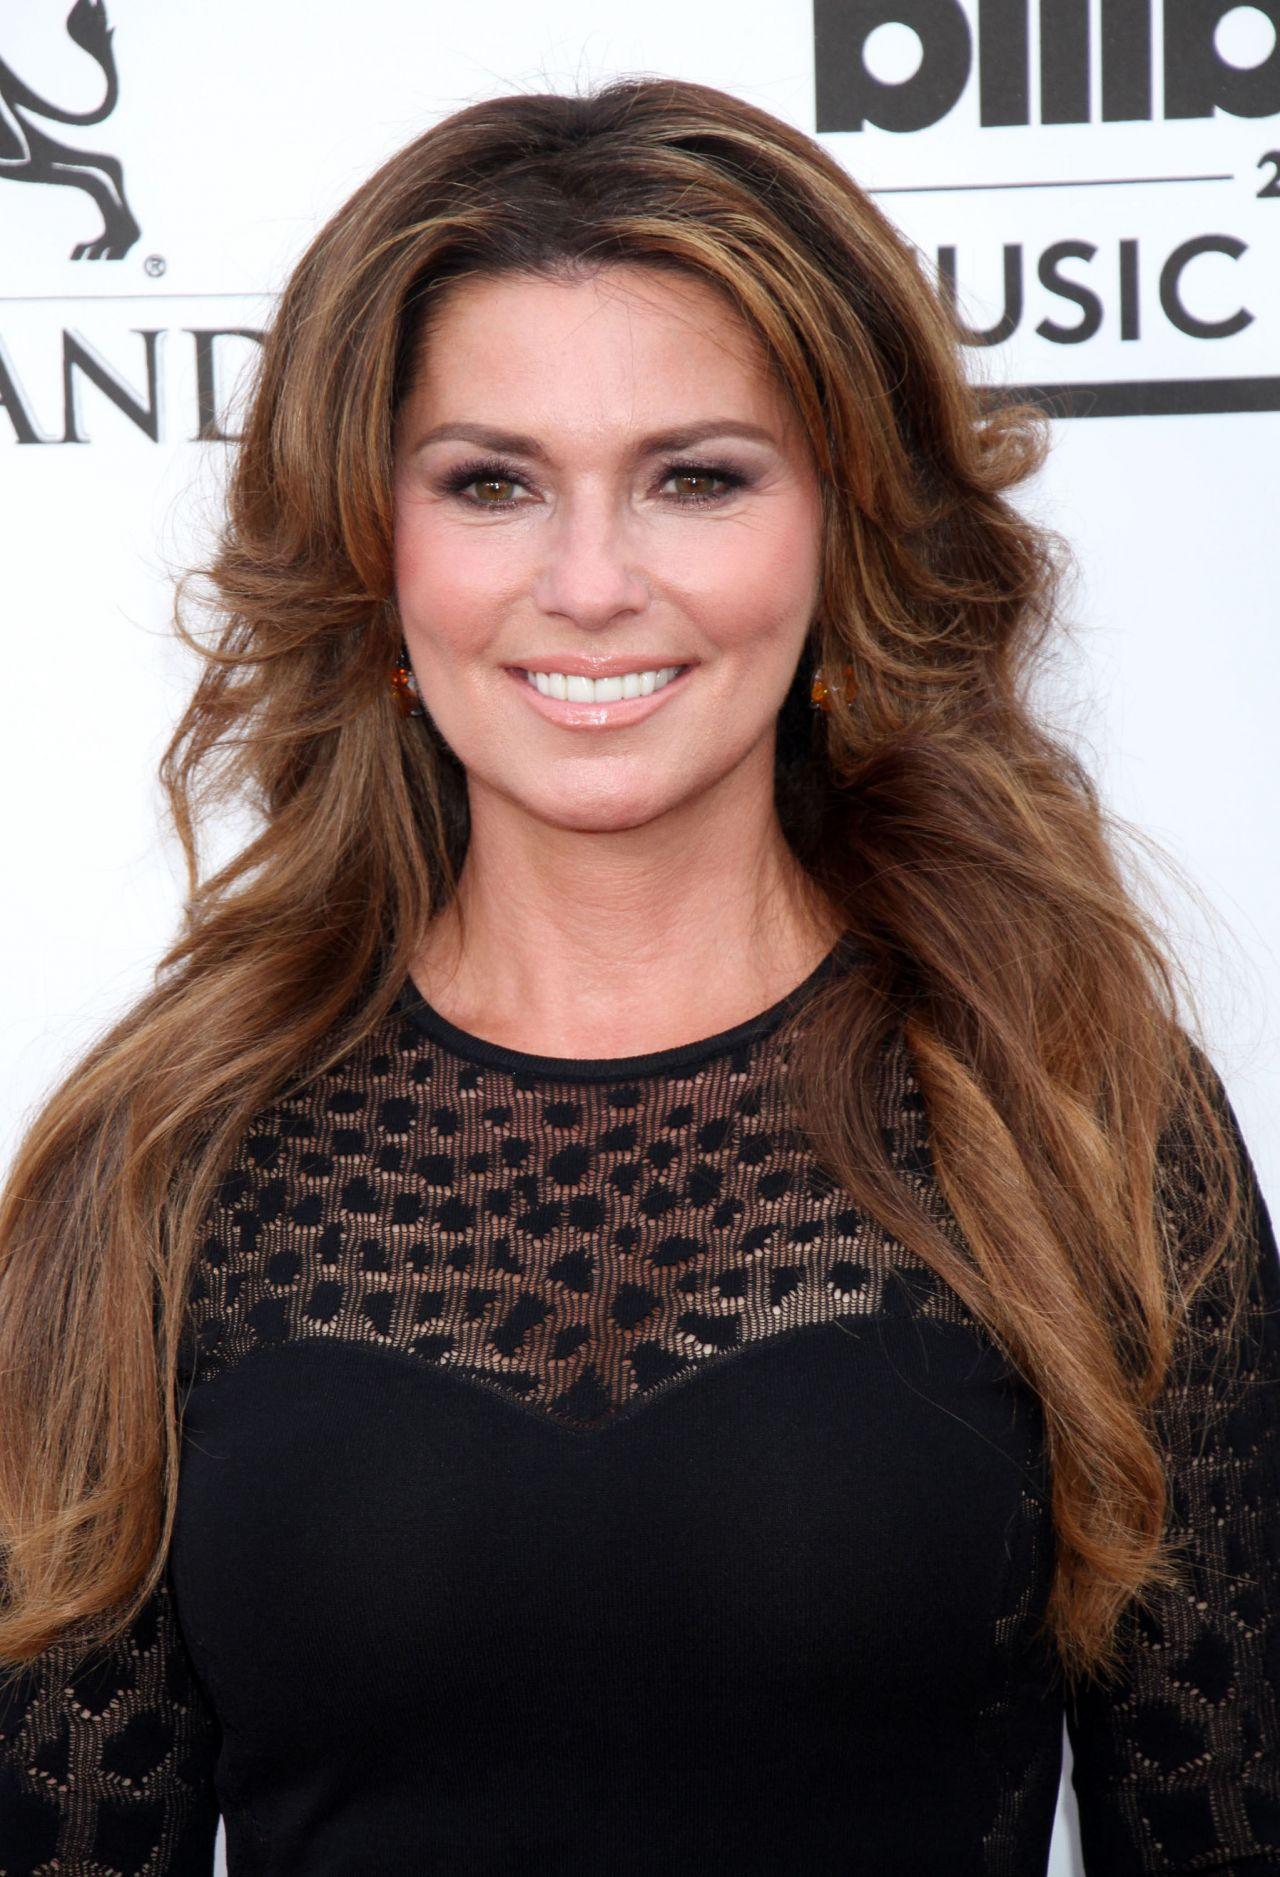 Shania Twain 2014 Billboard Music Awards In Las Vegas